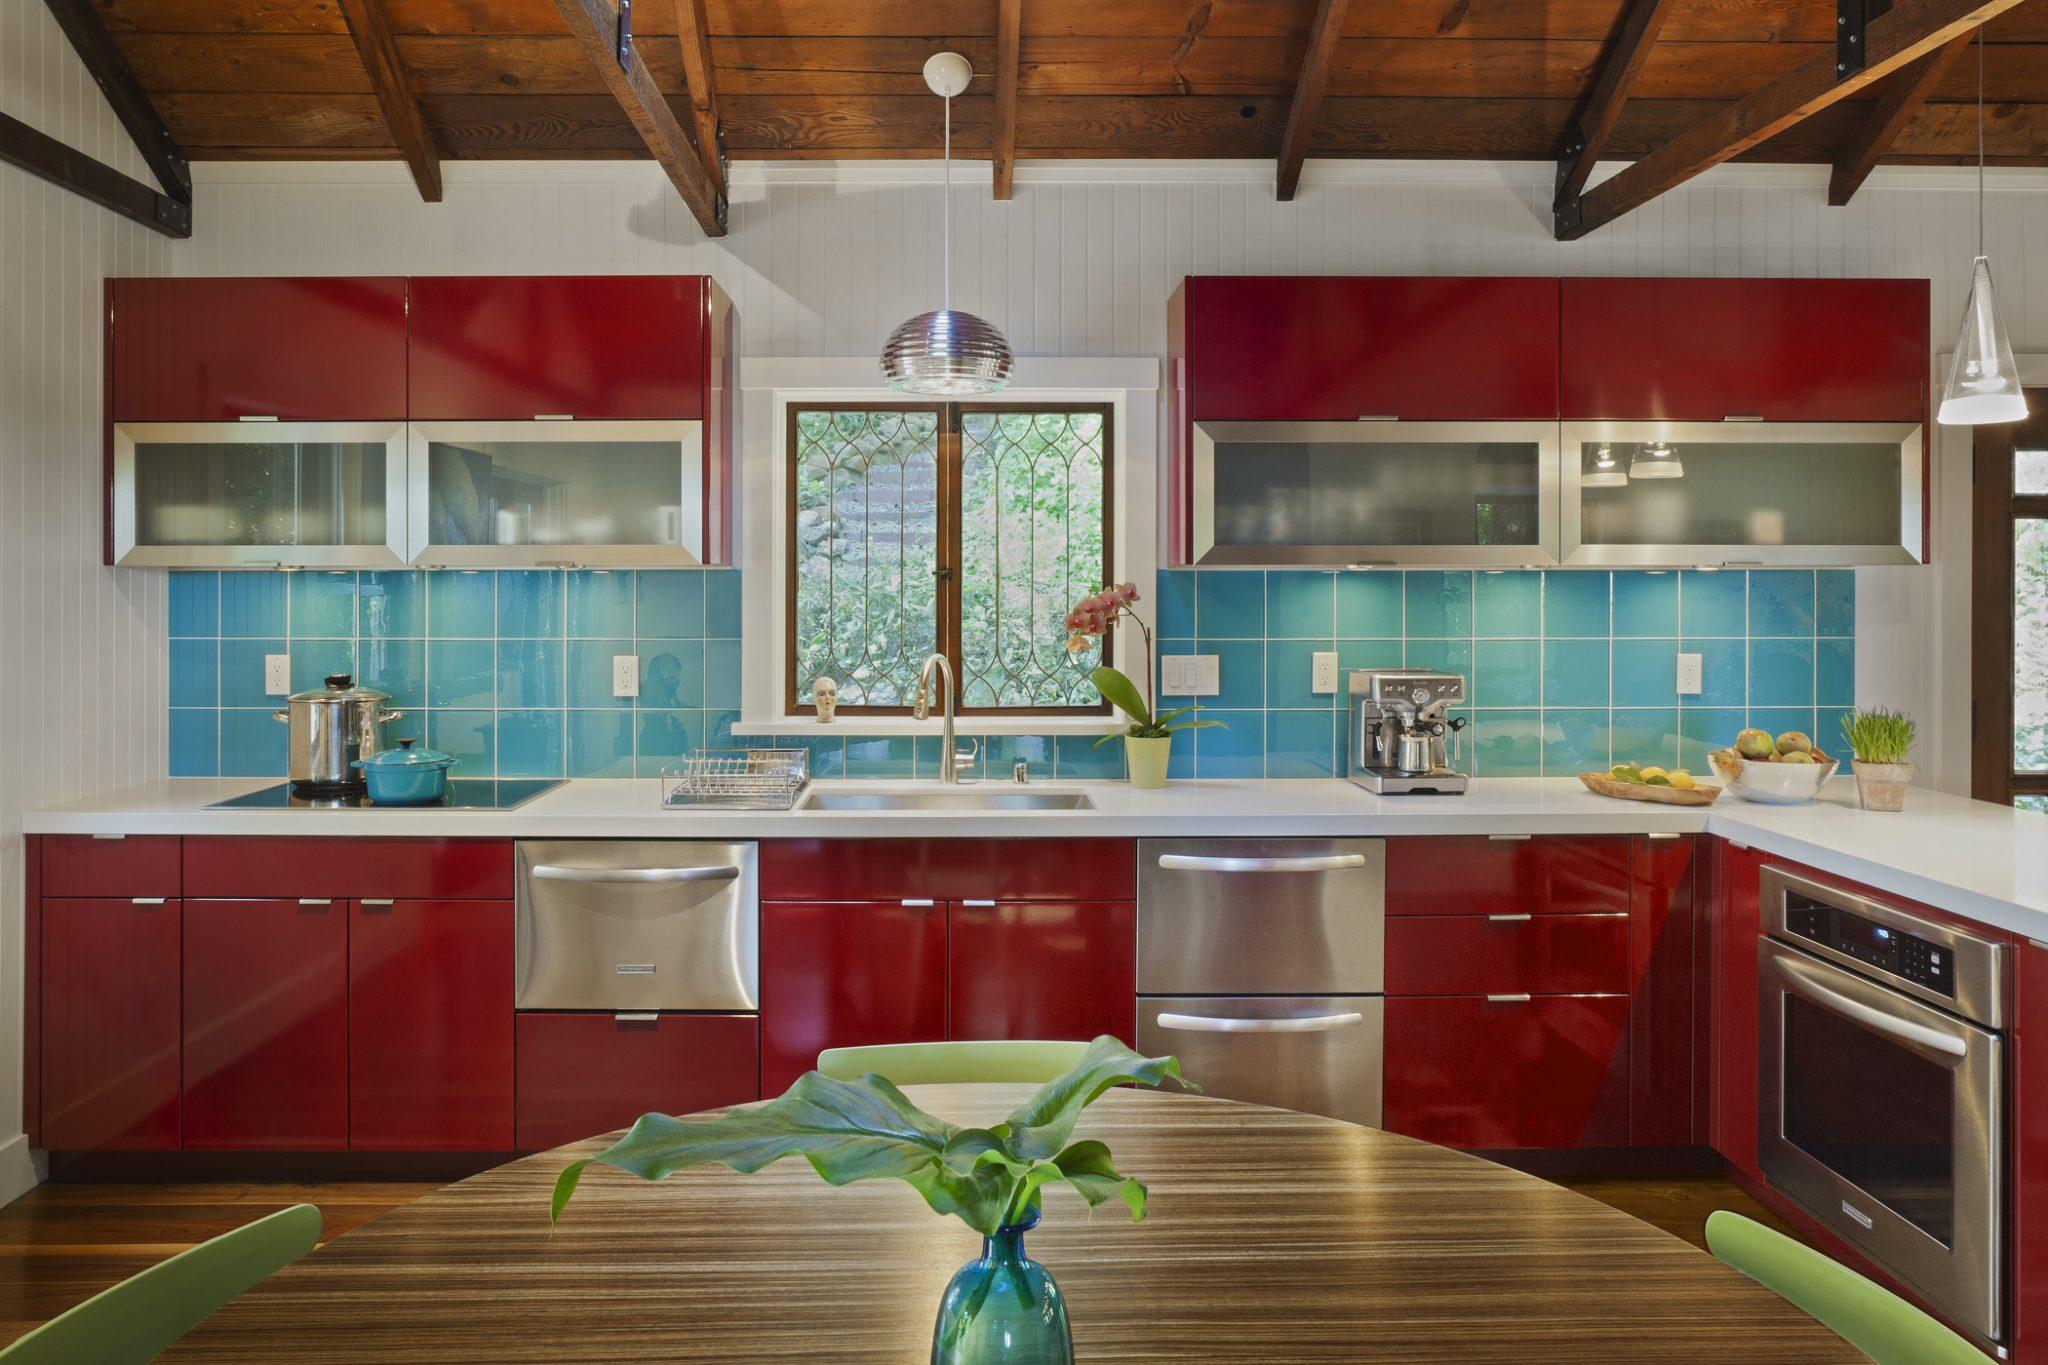 Redwood Escape Kitchen by Suzanne Childress Design